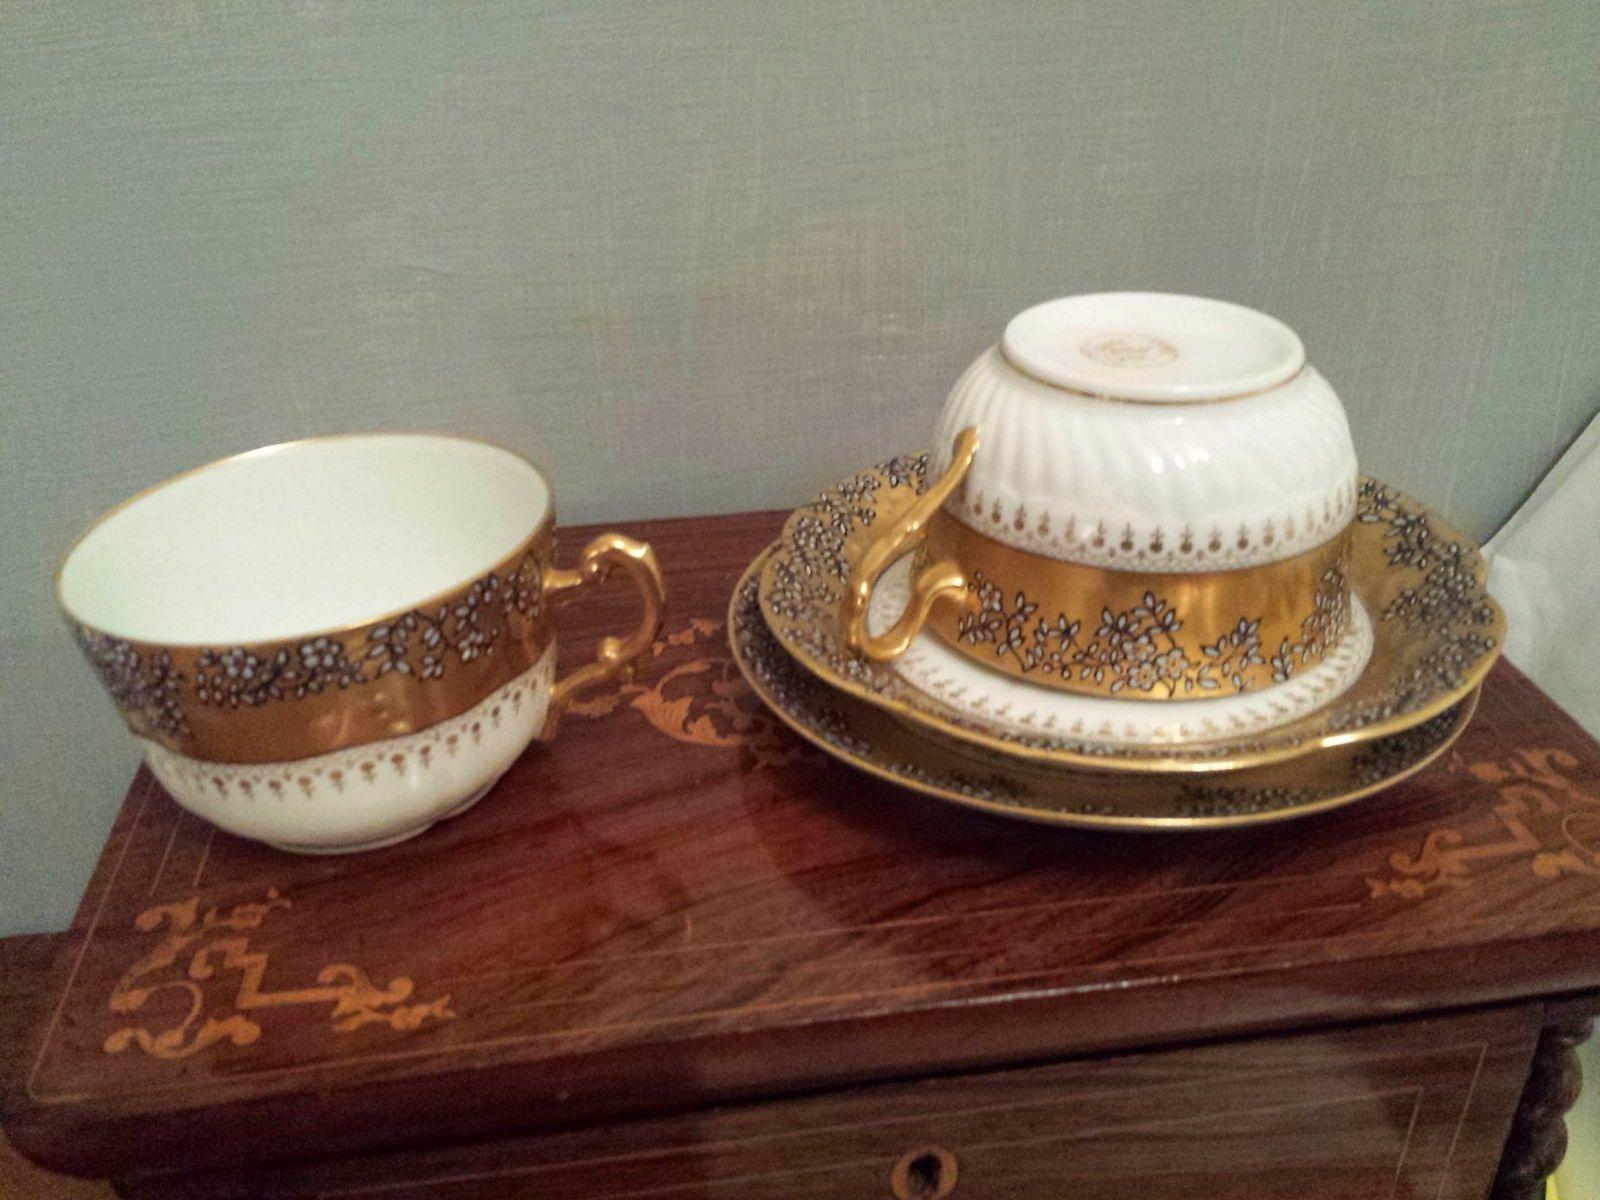 Porcelaine 18802tasses/ss tasses Or Mariage Monogrammees